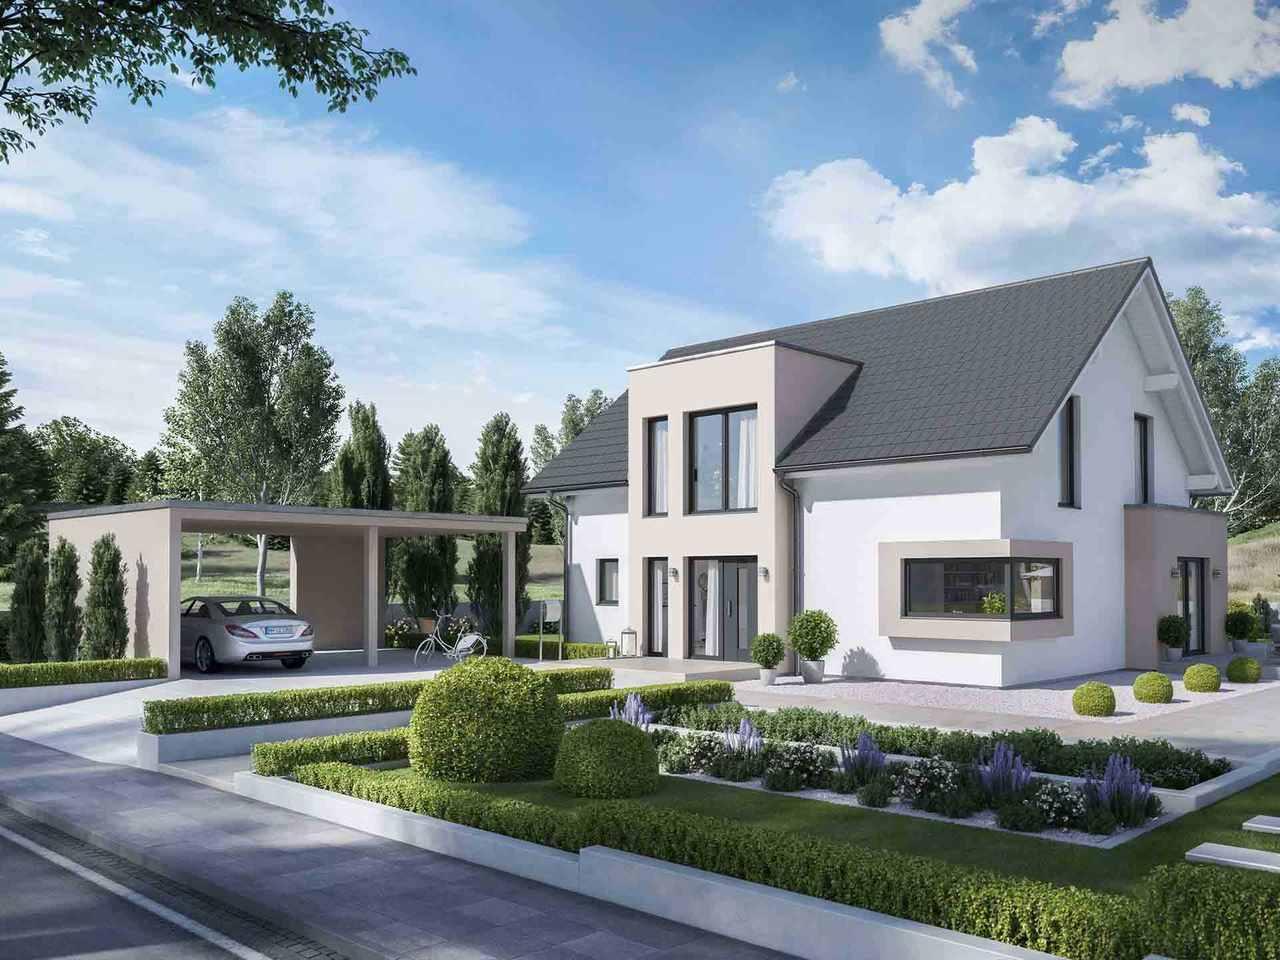 Einfamilienhaus Solitaire-E-165-E1 - Schwabenhaus